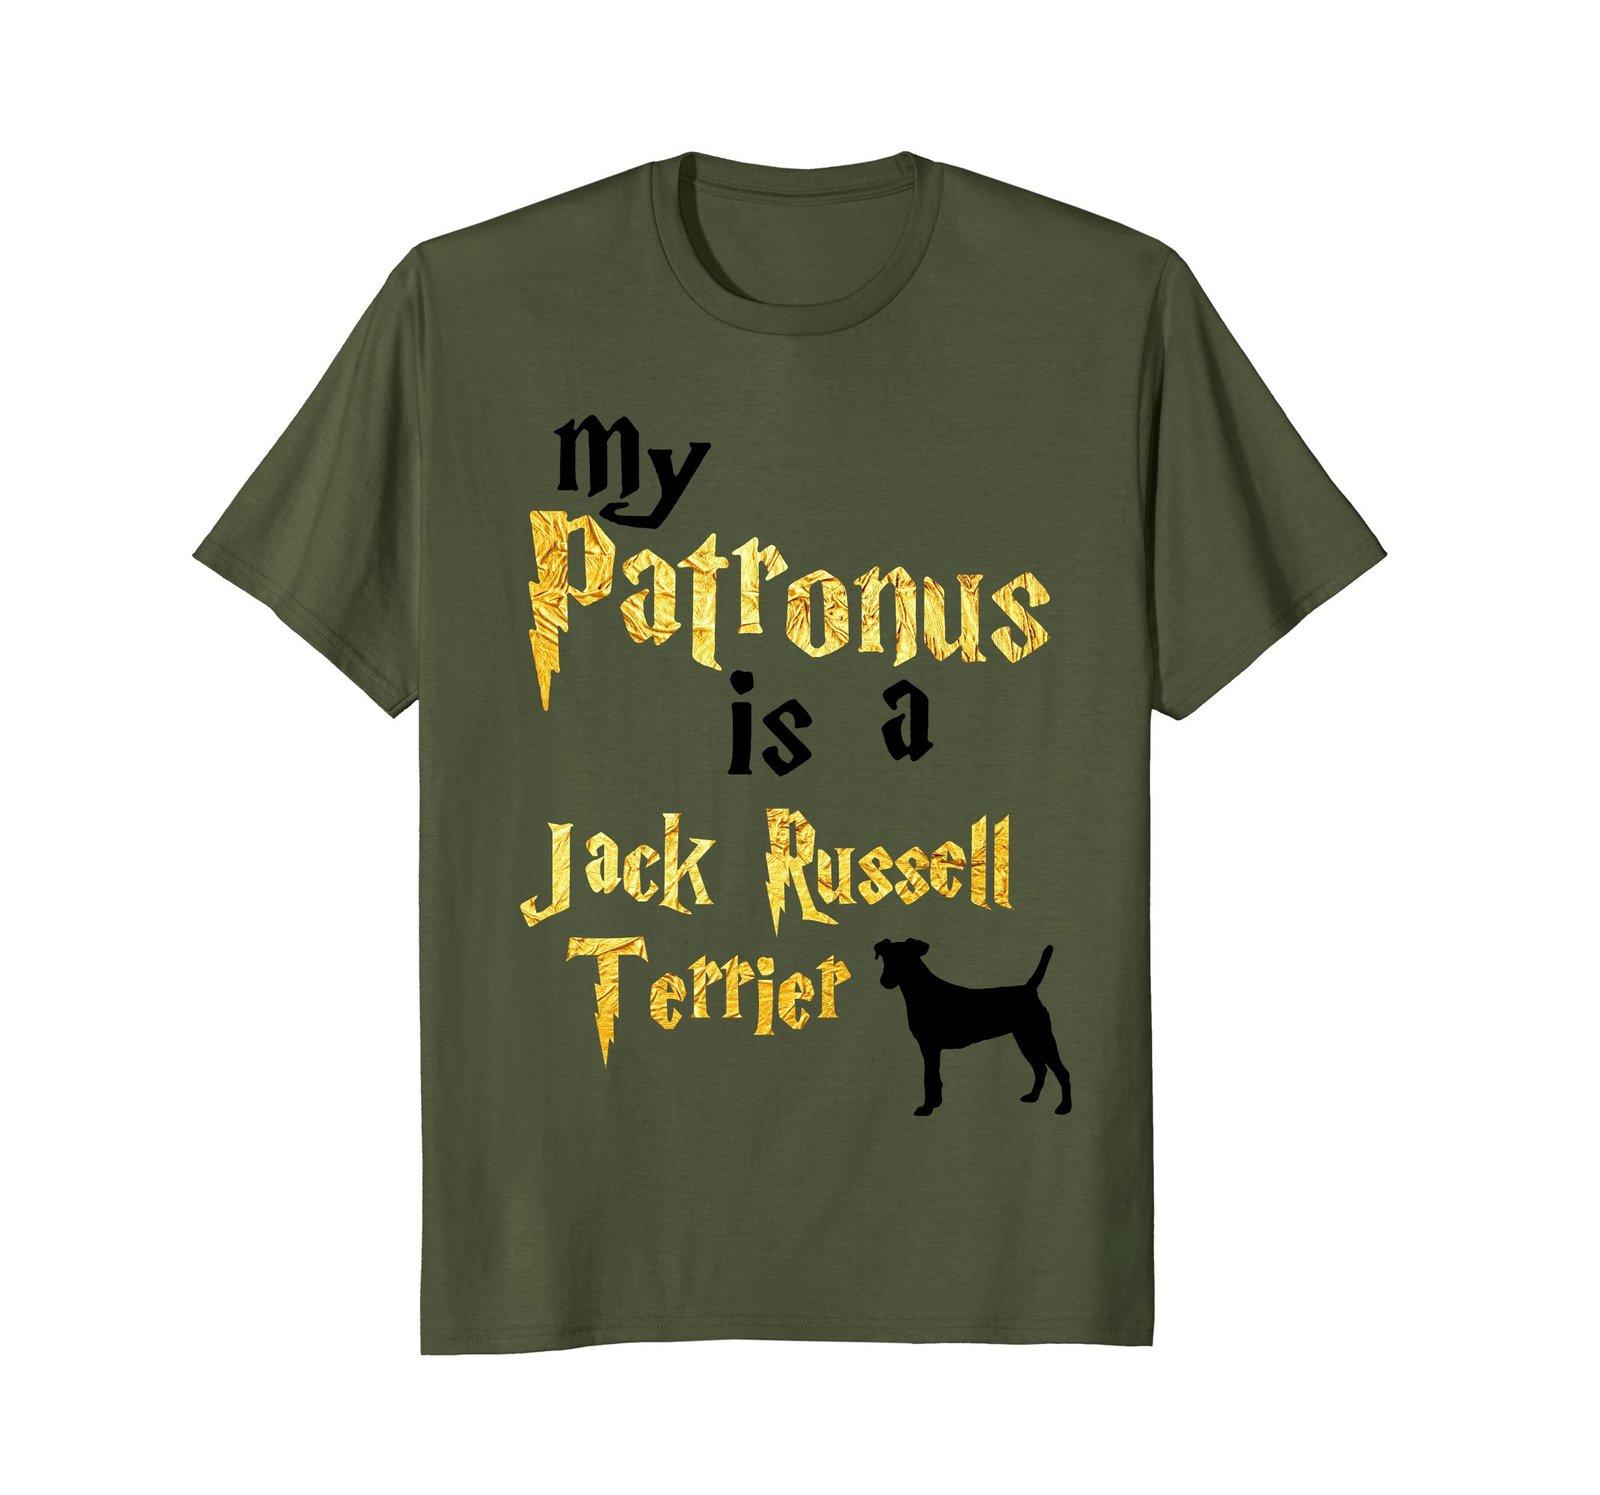 My Patronus Is A Jack Russell Terrier - Jack Russell Terrier